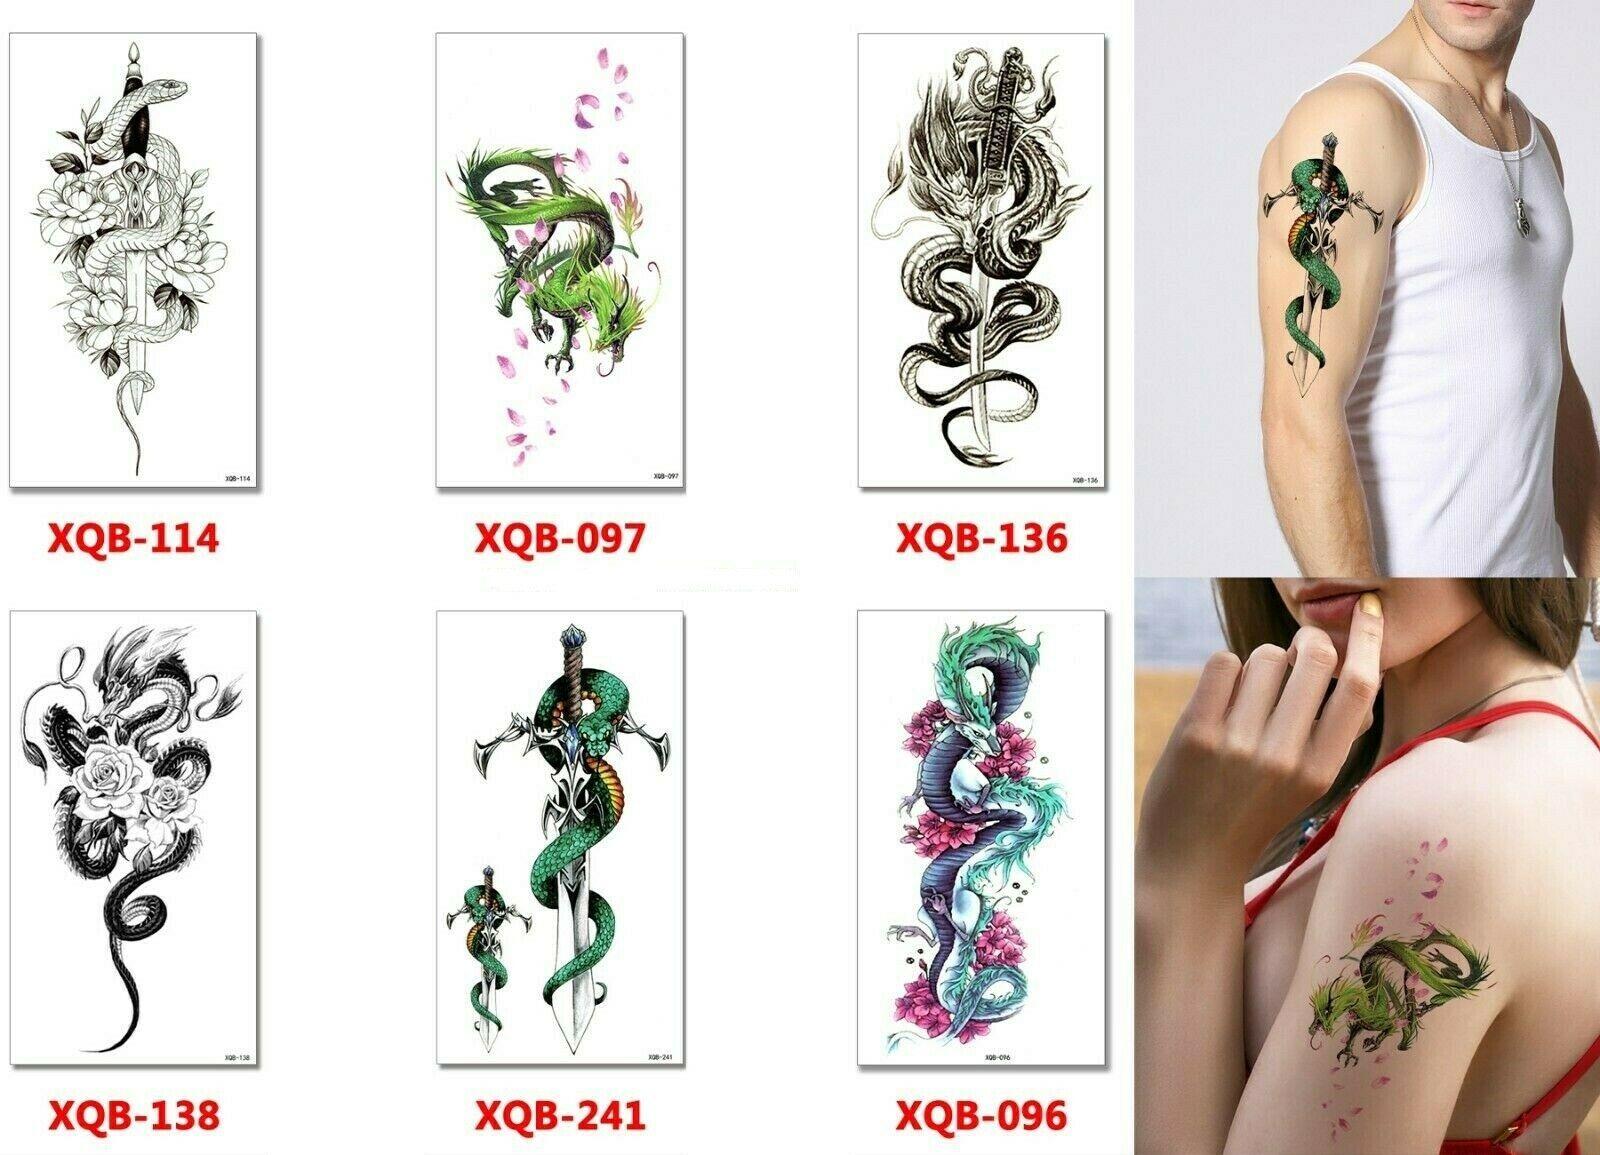 Dragon Temporary Tattoos Body Arm Sticker Half Sleeve Fake Waterproof (6 sheets)